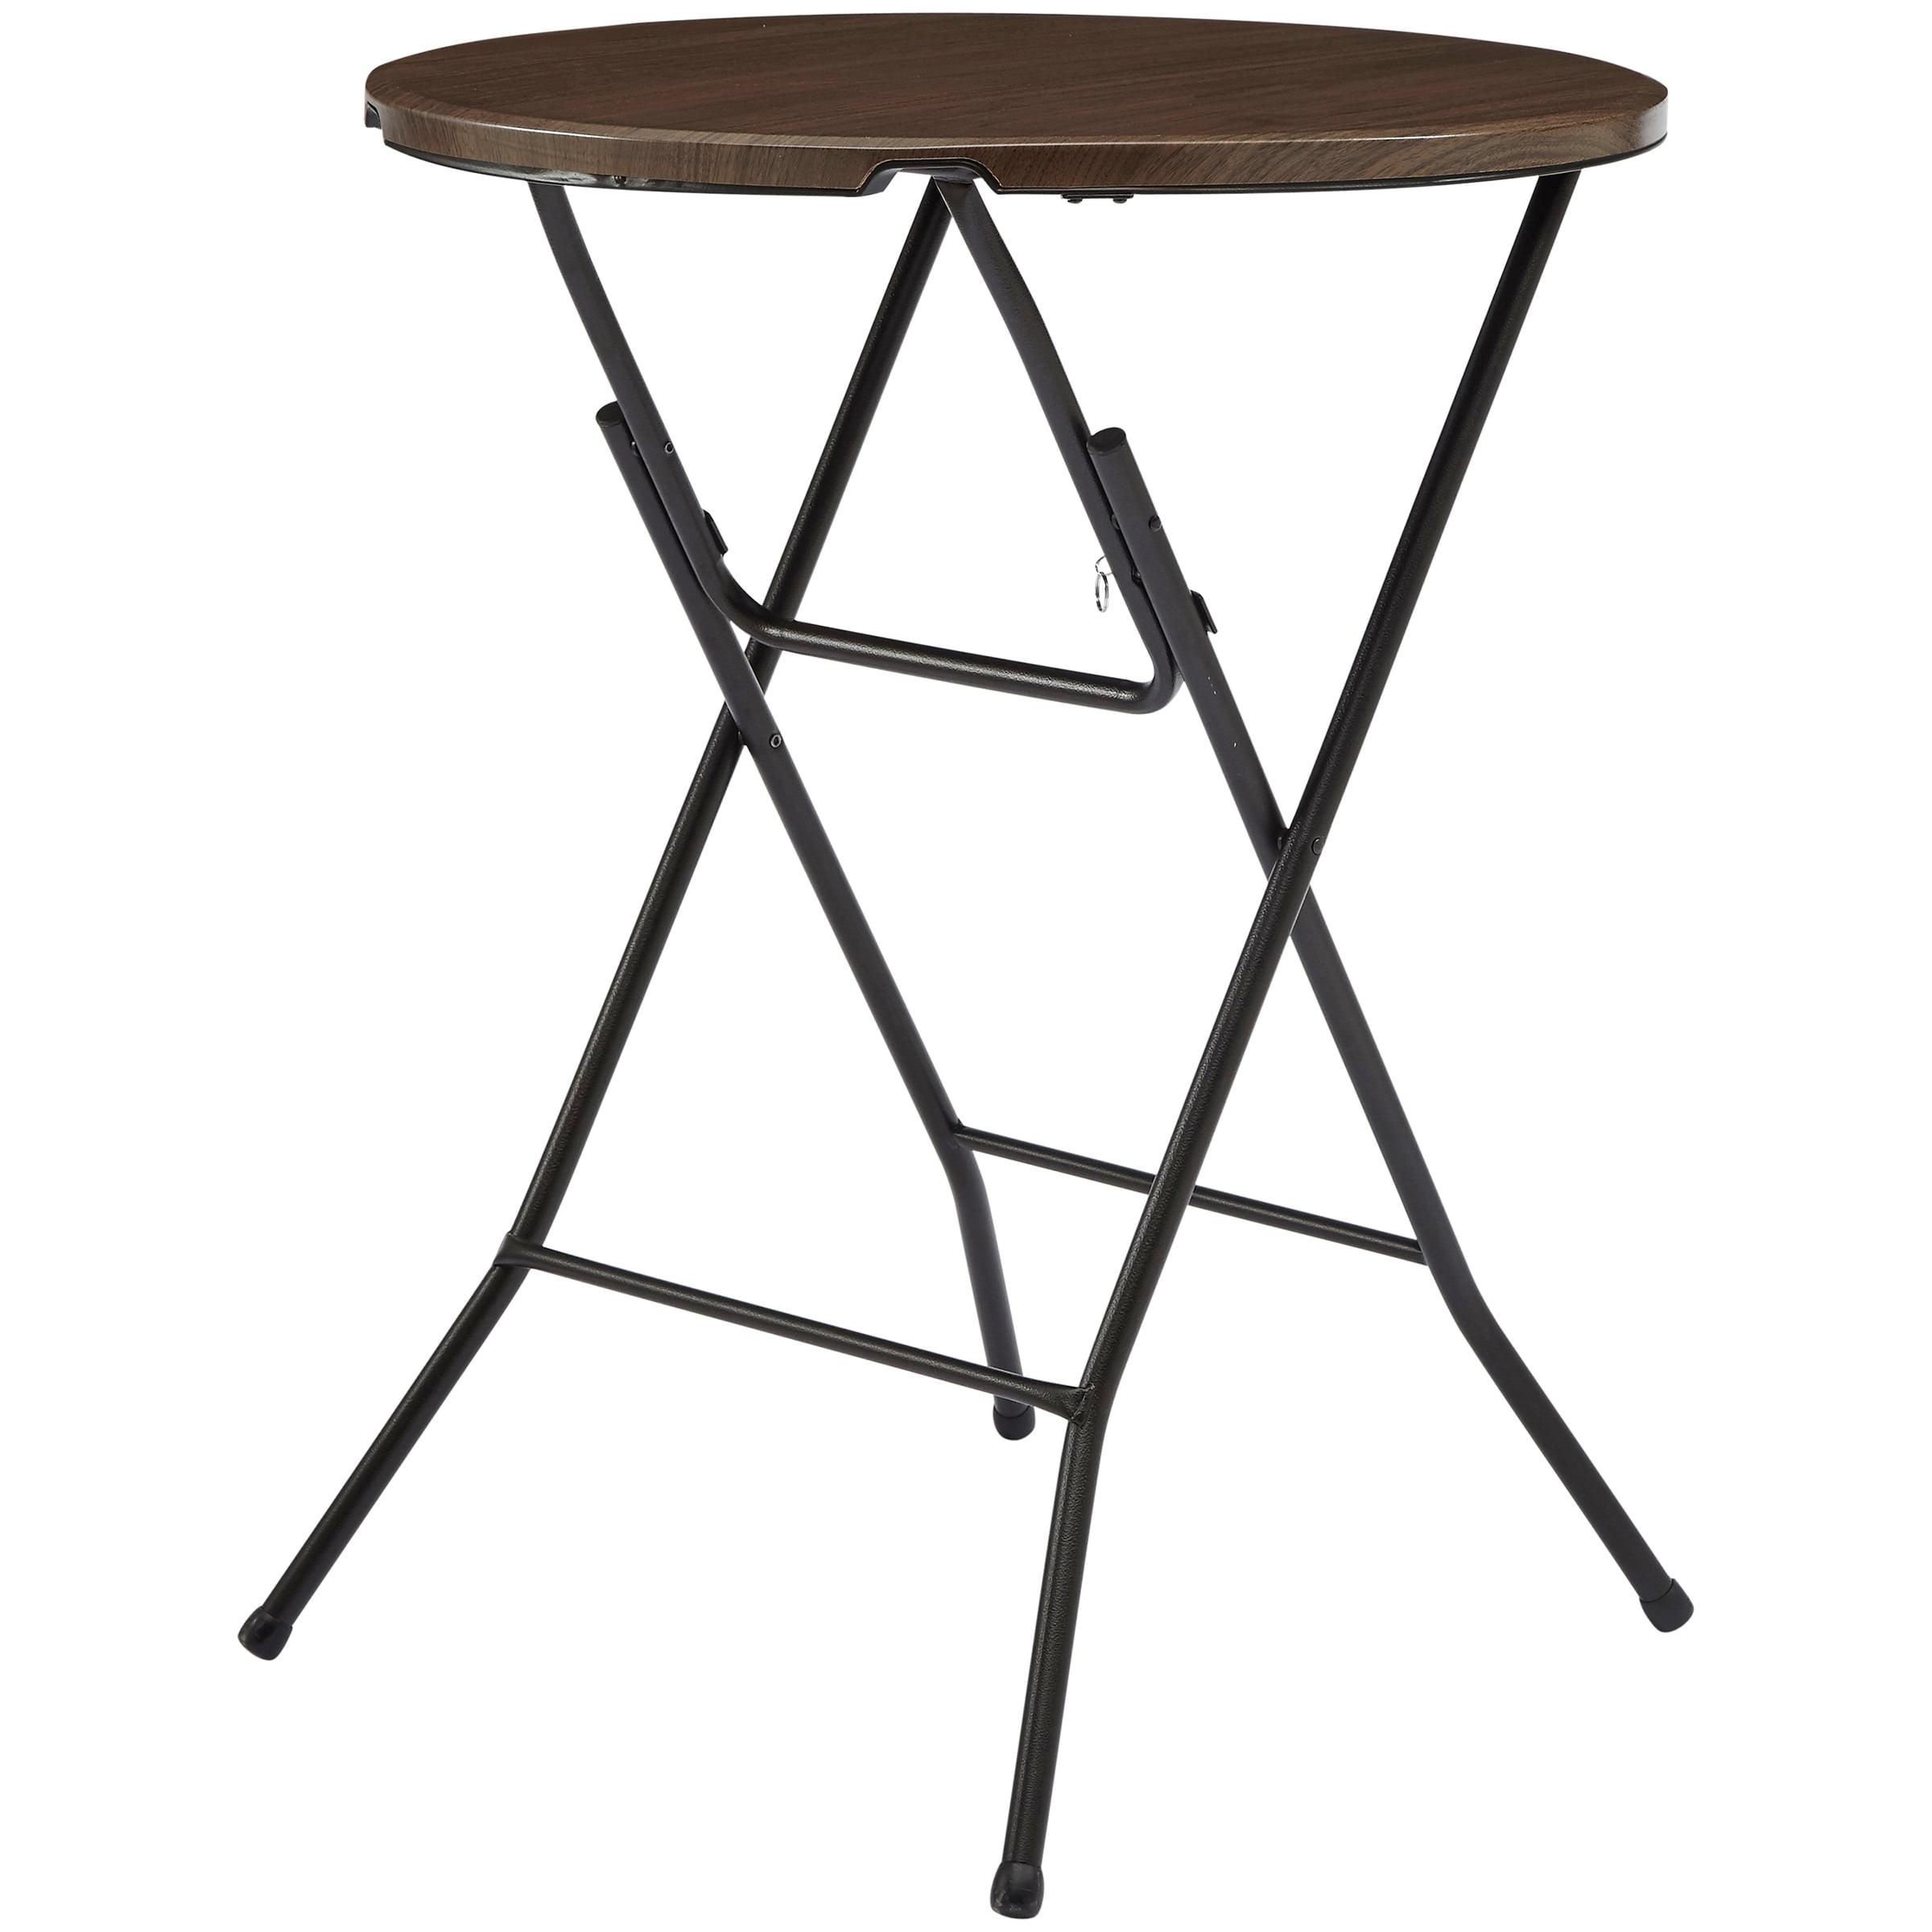 "Mainstays 31"" Round High Top Folding Table , Walnut by New Tec Integration Xiamen Co., Ltd."